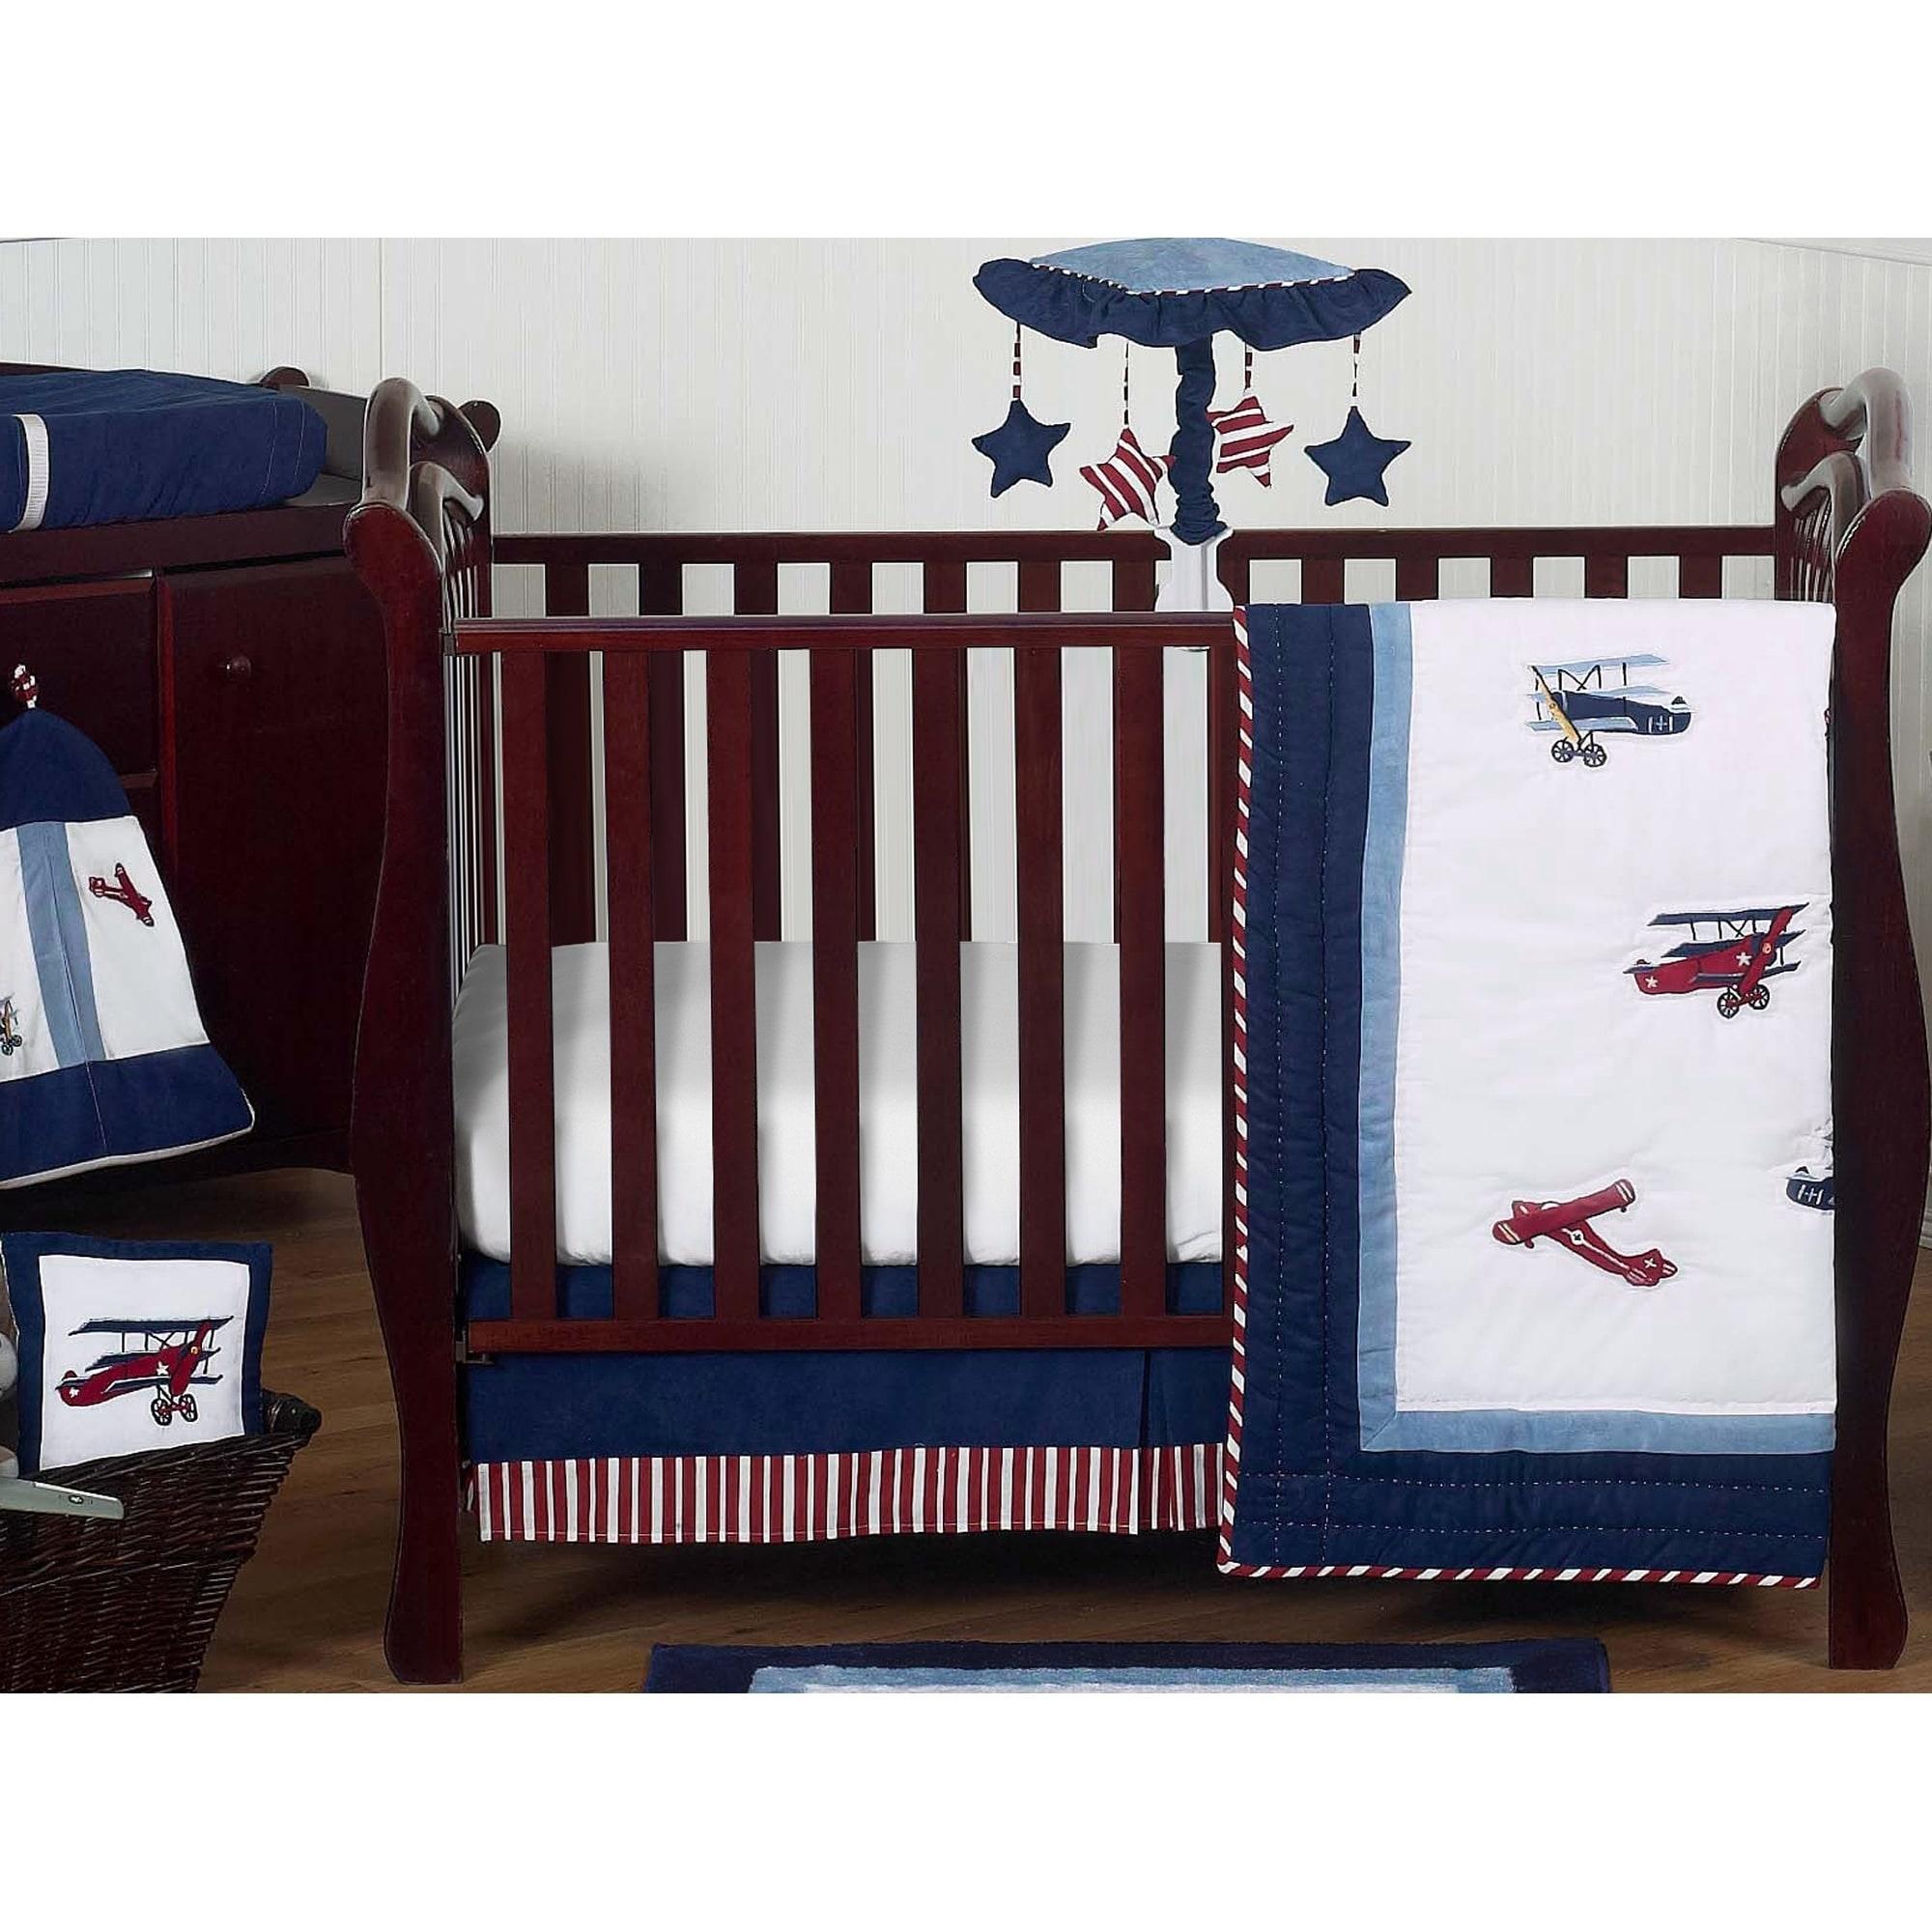 Sweet Jojo Designs Red White And Blue Aviator Plane 11 Piece Perless Crib Bedding Set